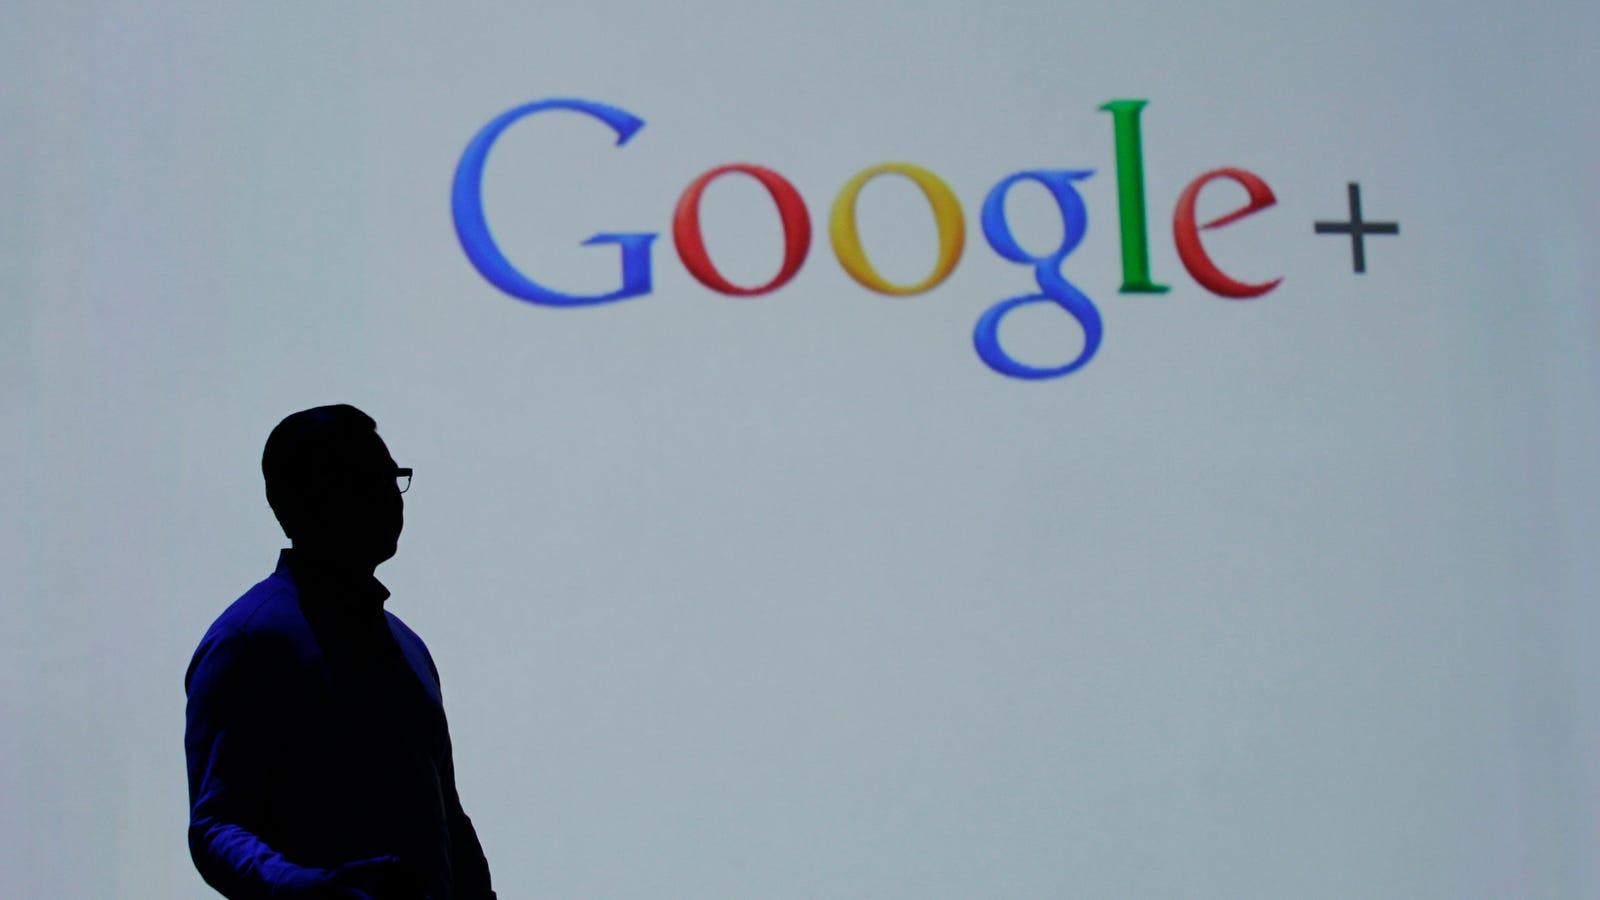 QnA VBage Senators Join Call to Investigate Google Over Apps Sharing Kids' Private Info